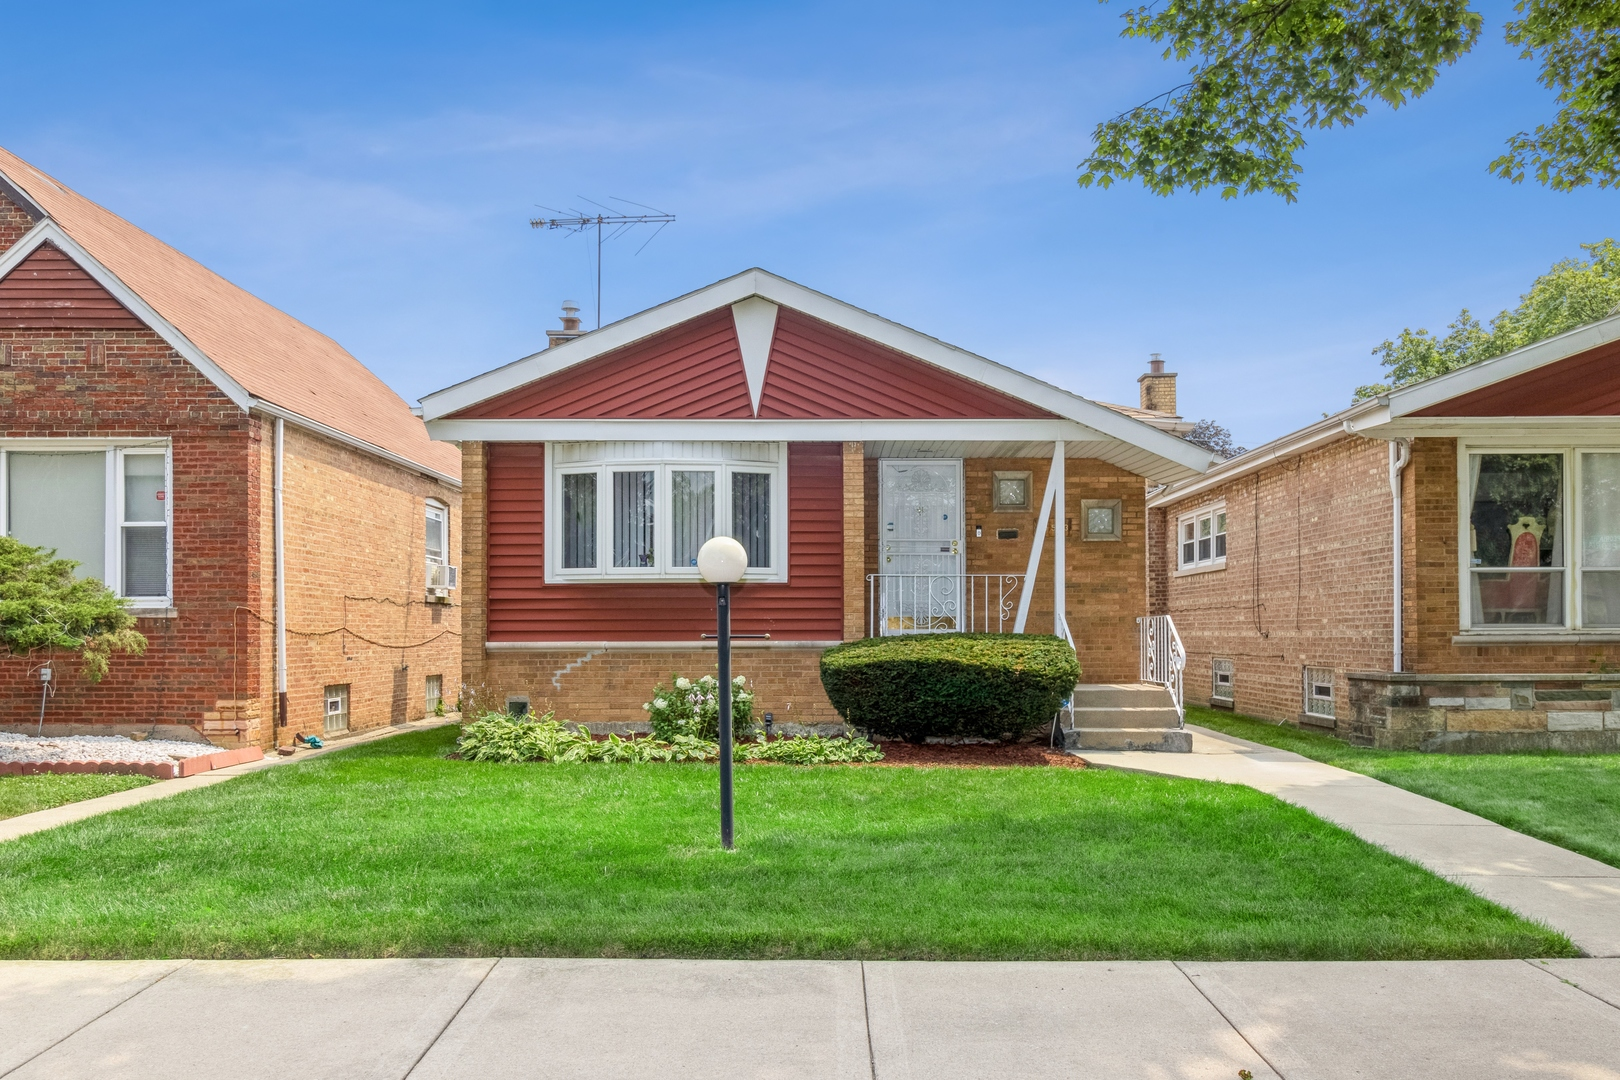 10553 S Peoria Street, Chicago IL 60643